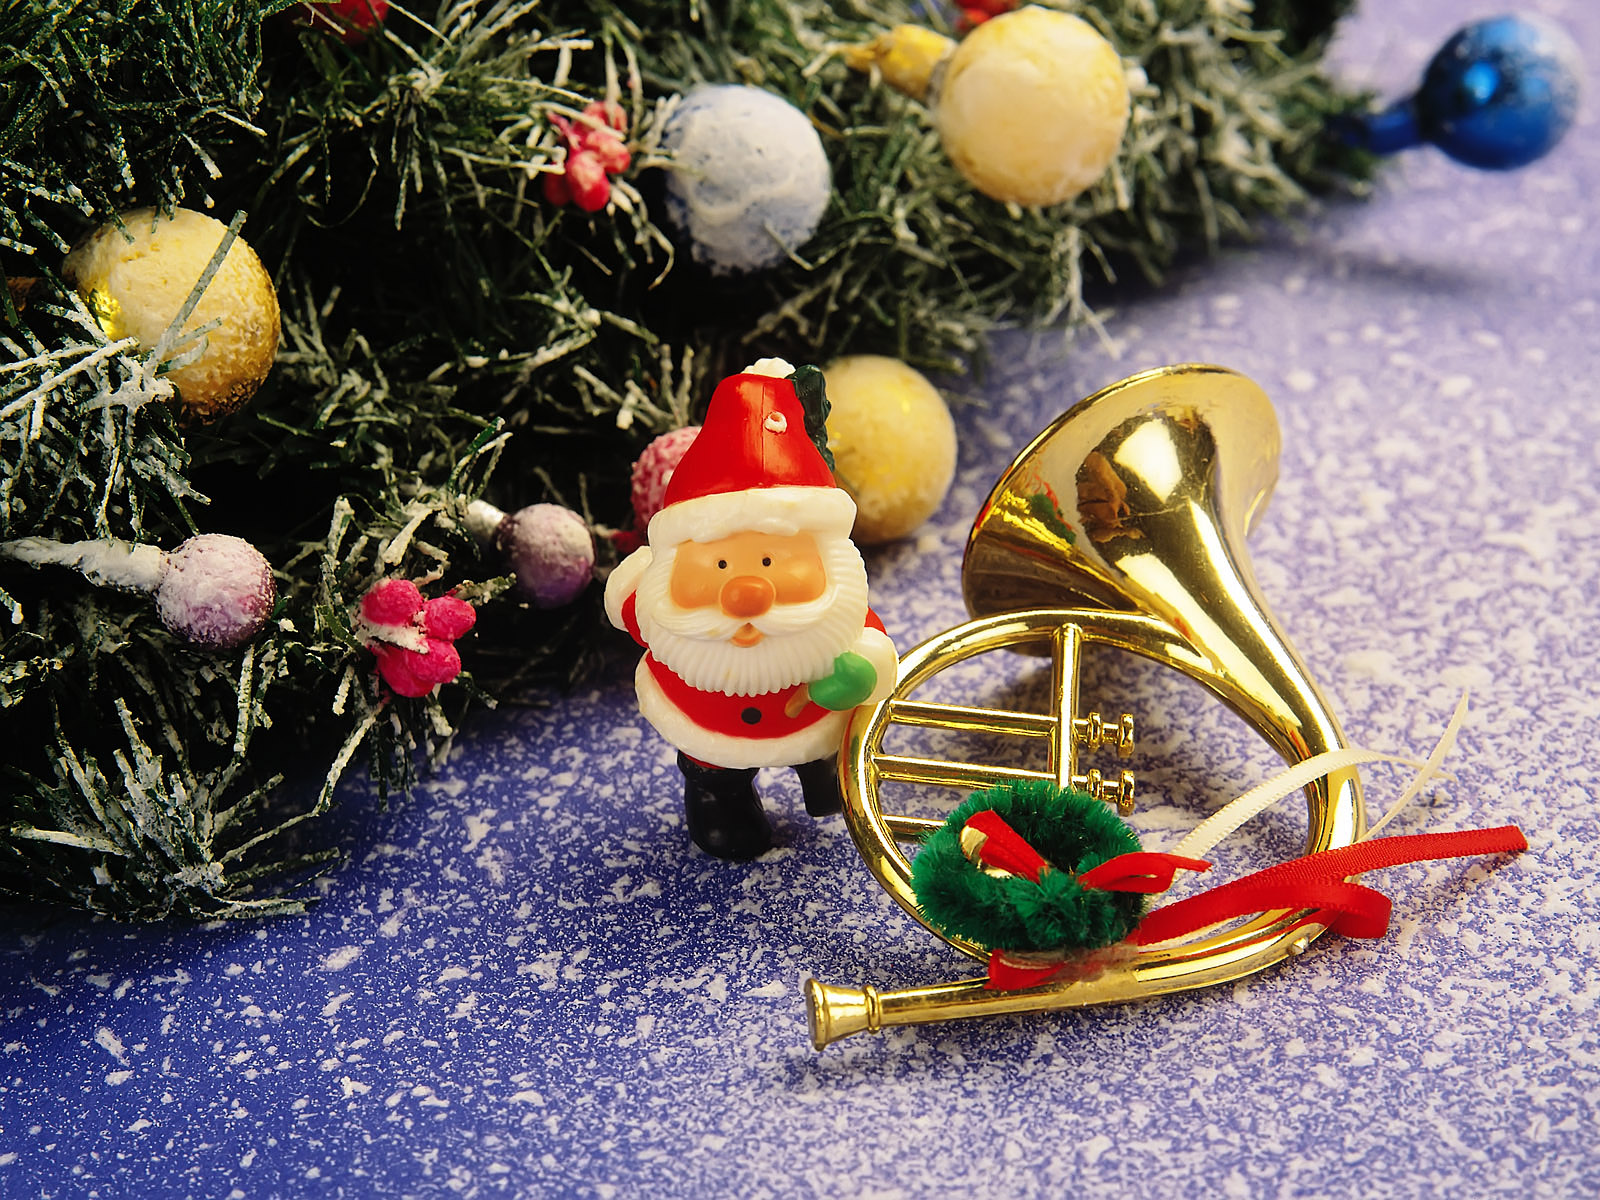 http://1.bp.blogspot.com/-vx6r8JWESiU/Tq_TMk_1SLI/AAAAAAAAP3w/fGuQl7CHmr8/s1600/Mooie-kerstman-achtergronden-leuke-kerstman-wallpapers-afbeelding-plaatje-foto-26.jpg